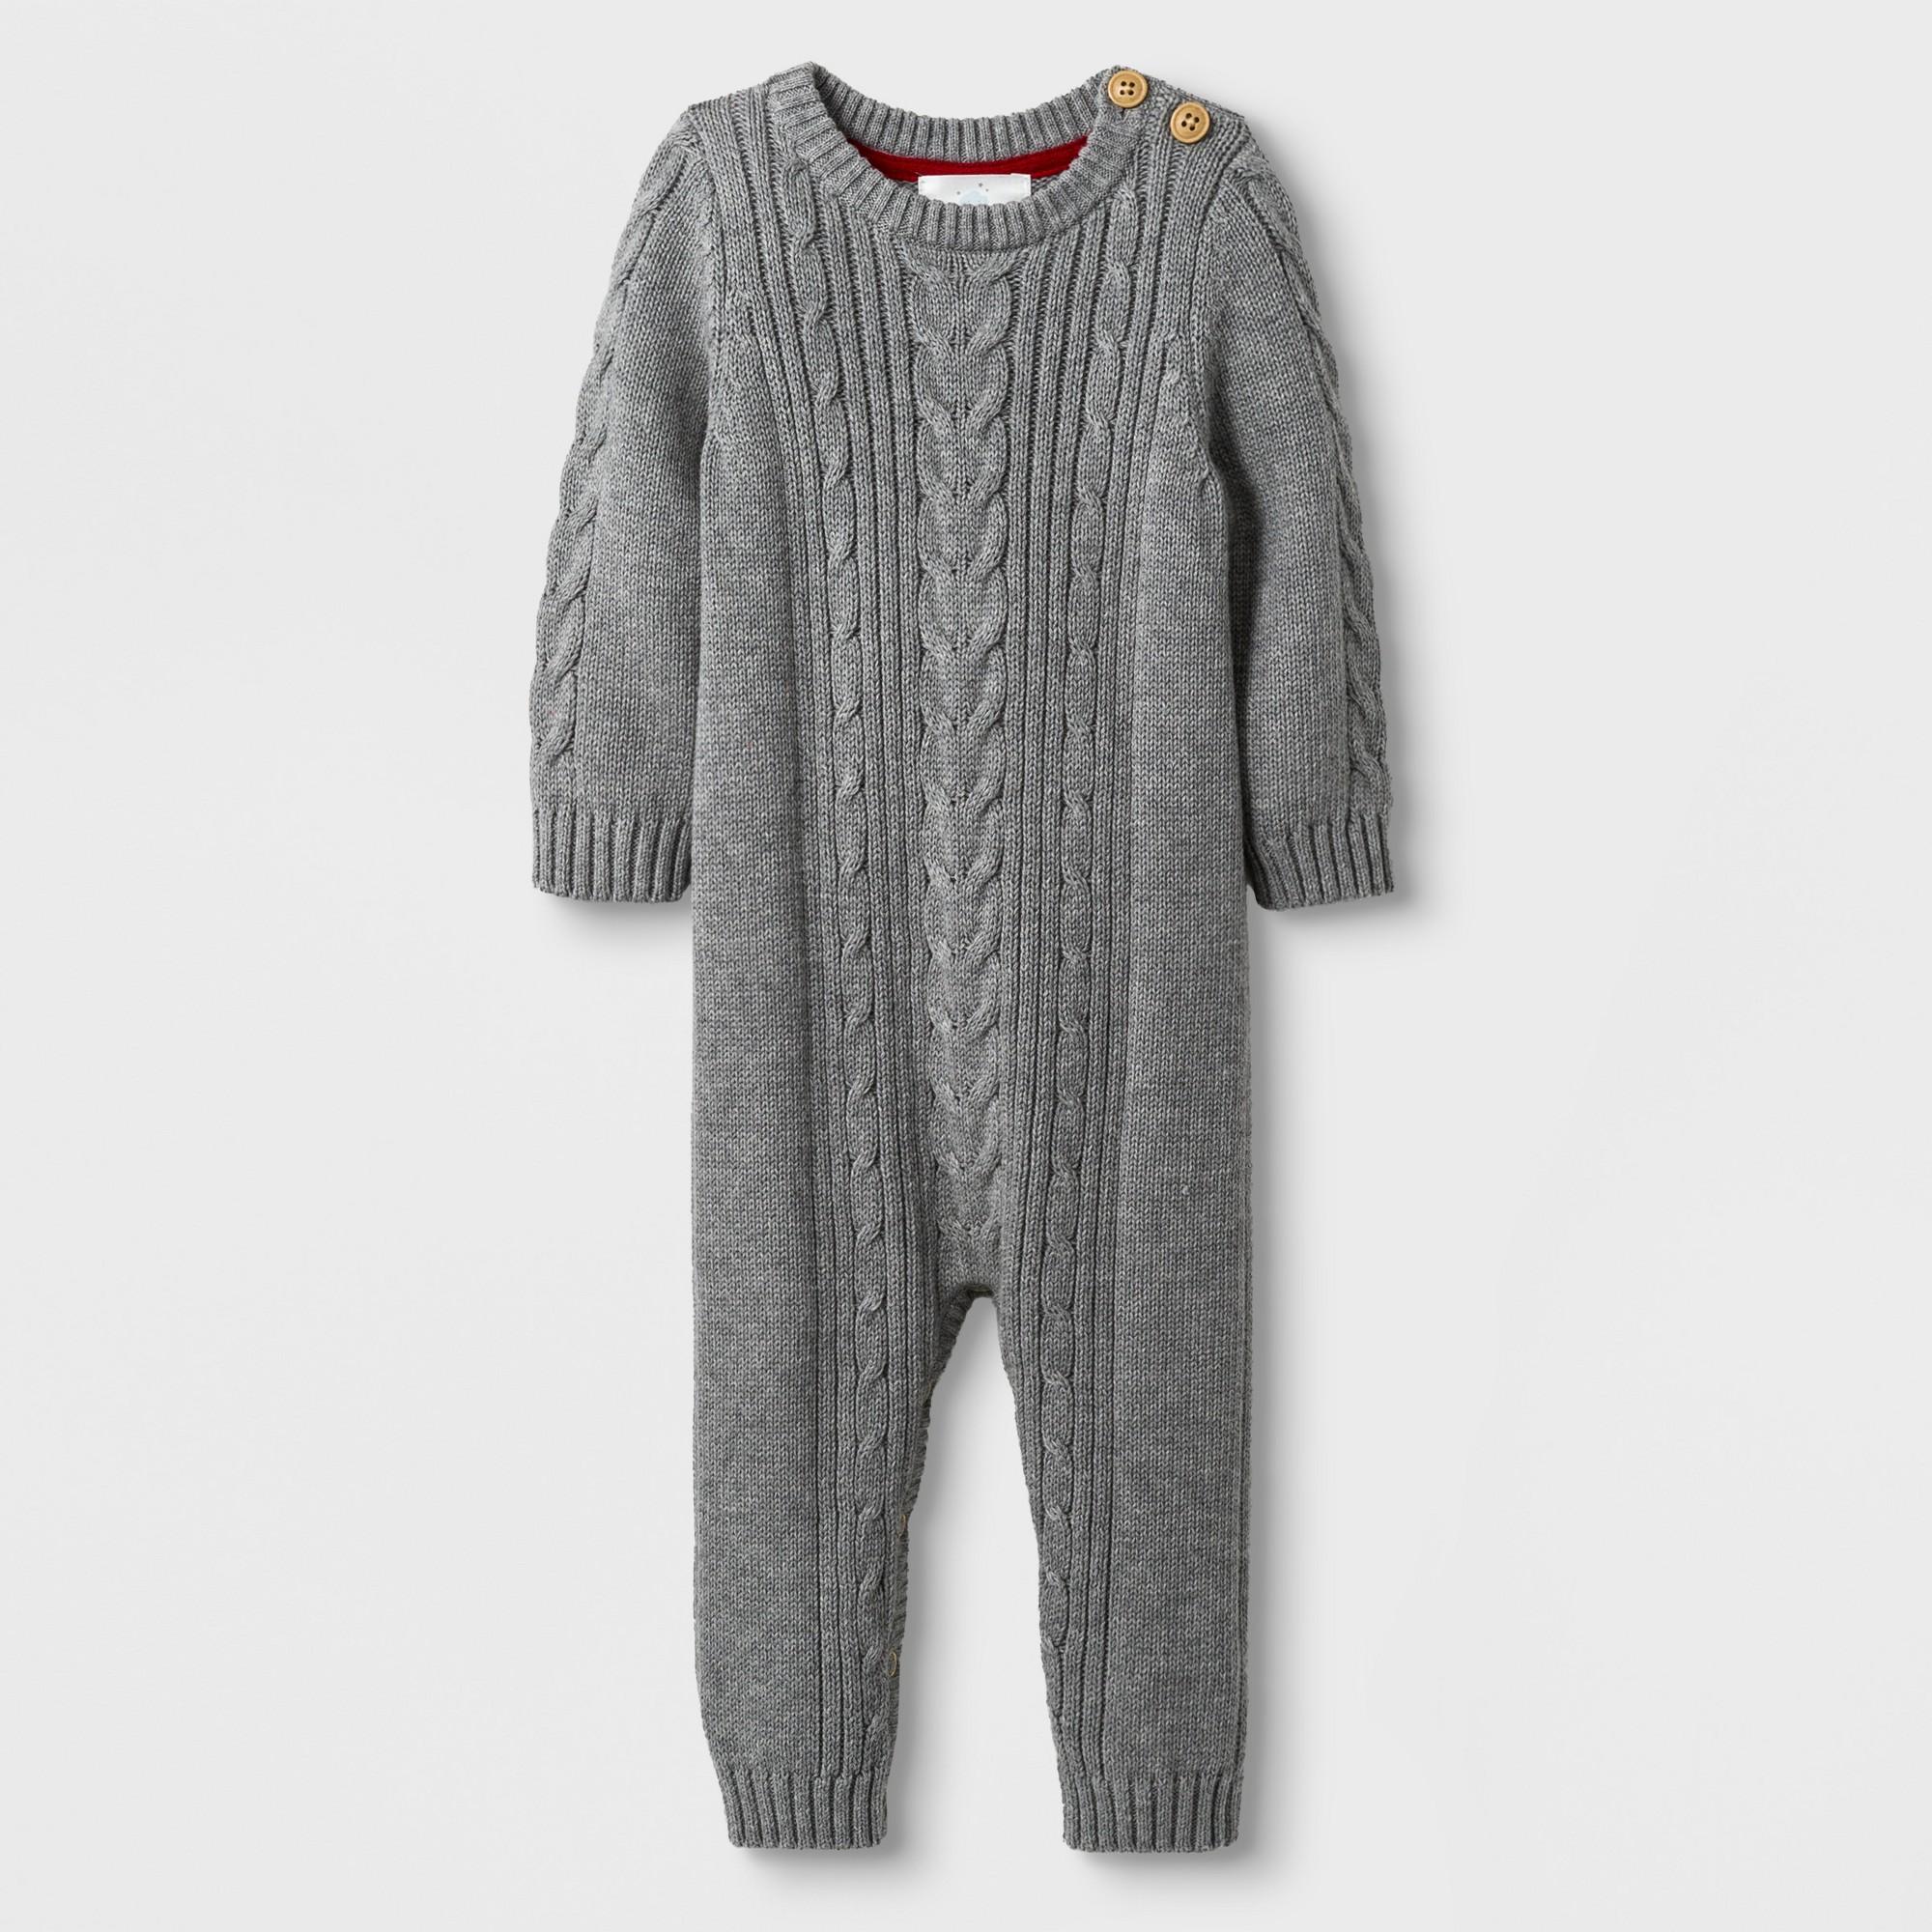 f55161ca2 Baby Girls' Long Sleeve Cable Sweater Romper - Cloud Island Heather Gray  Newborn